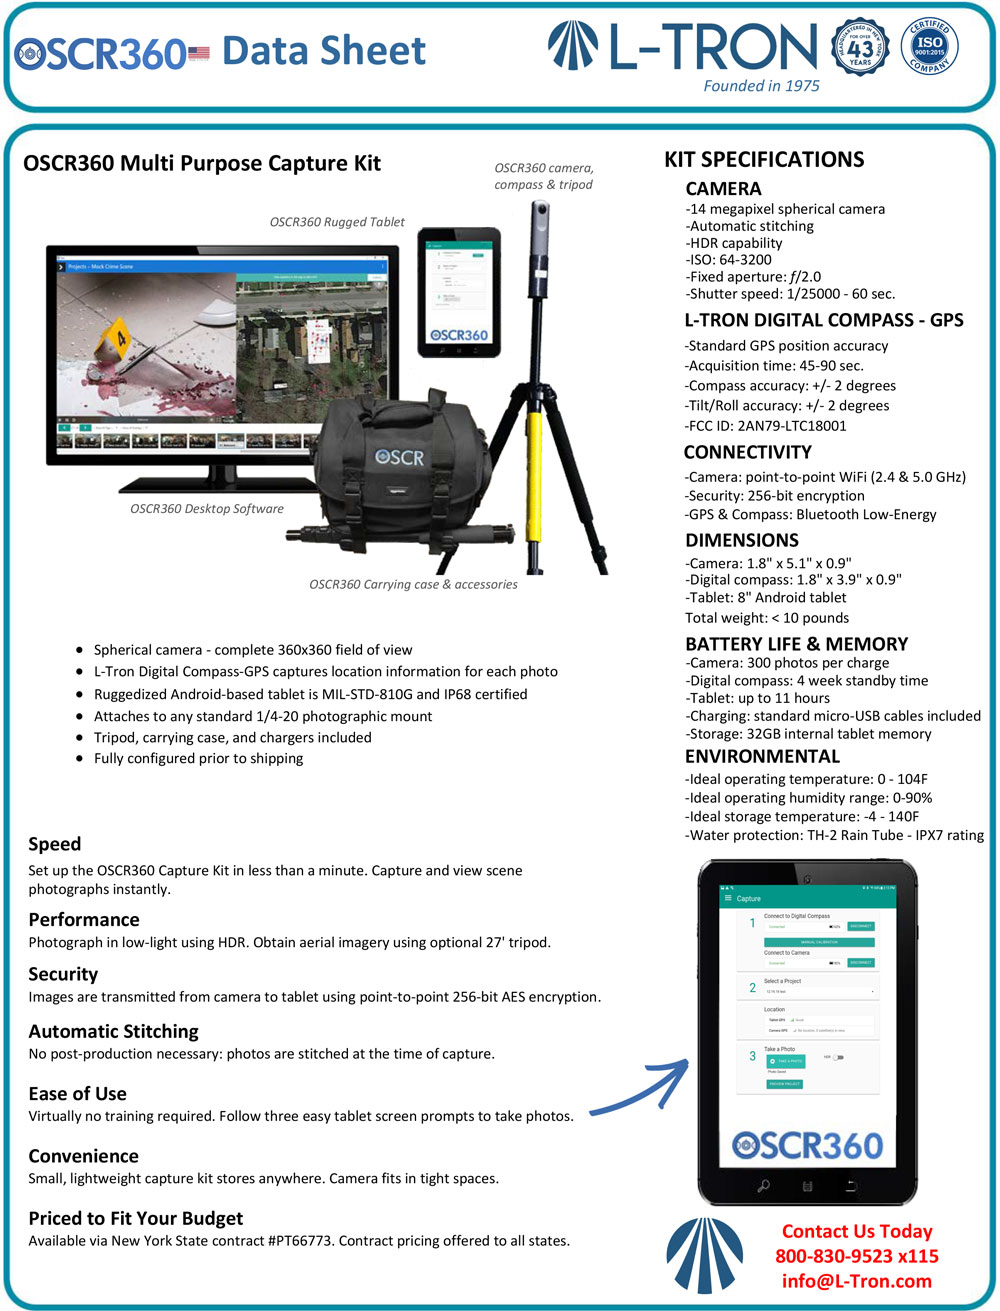 OSCR360 Datasheet Capture Kit